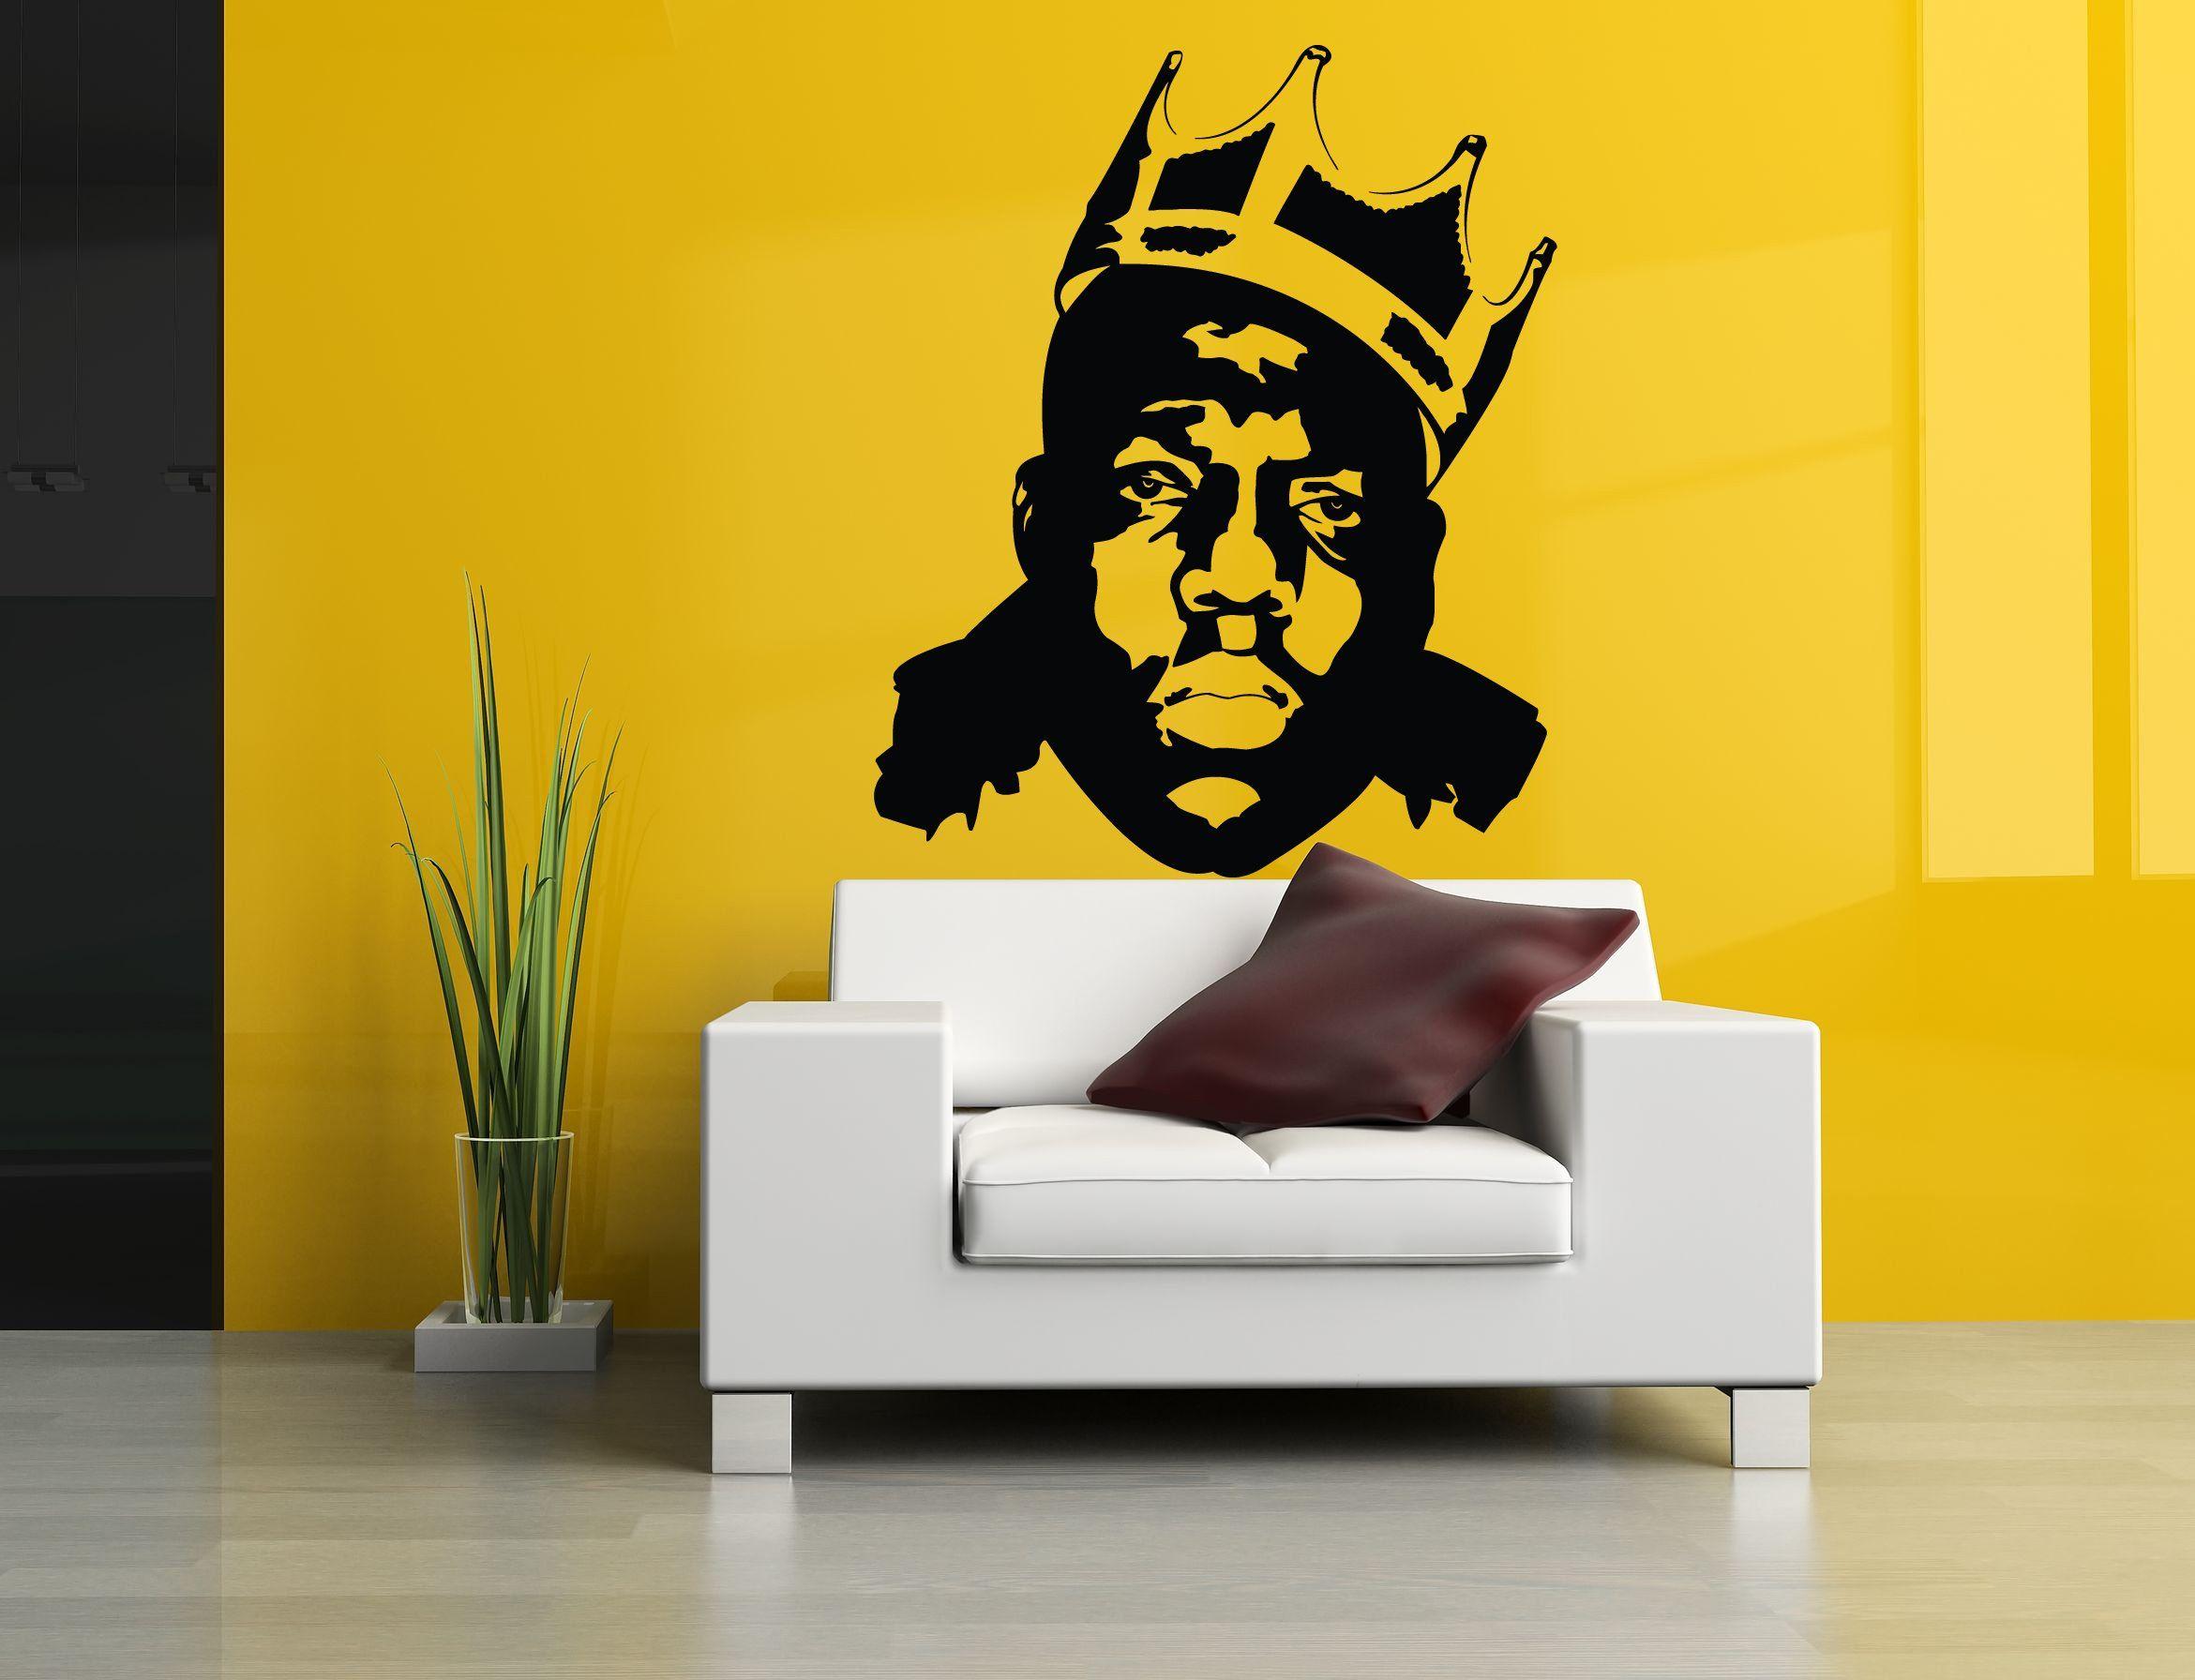 Wall Room Decor Art Vinyl Sticker Mural Decal Rap Hip Hop Star Big ...